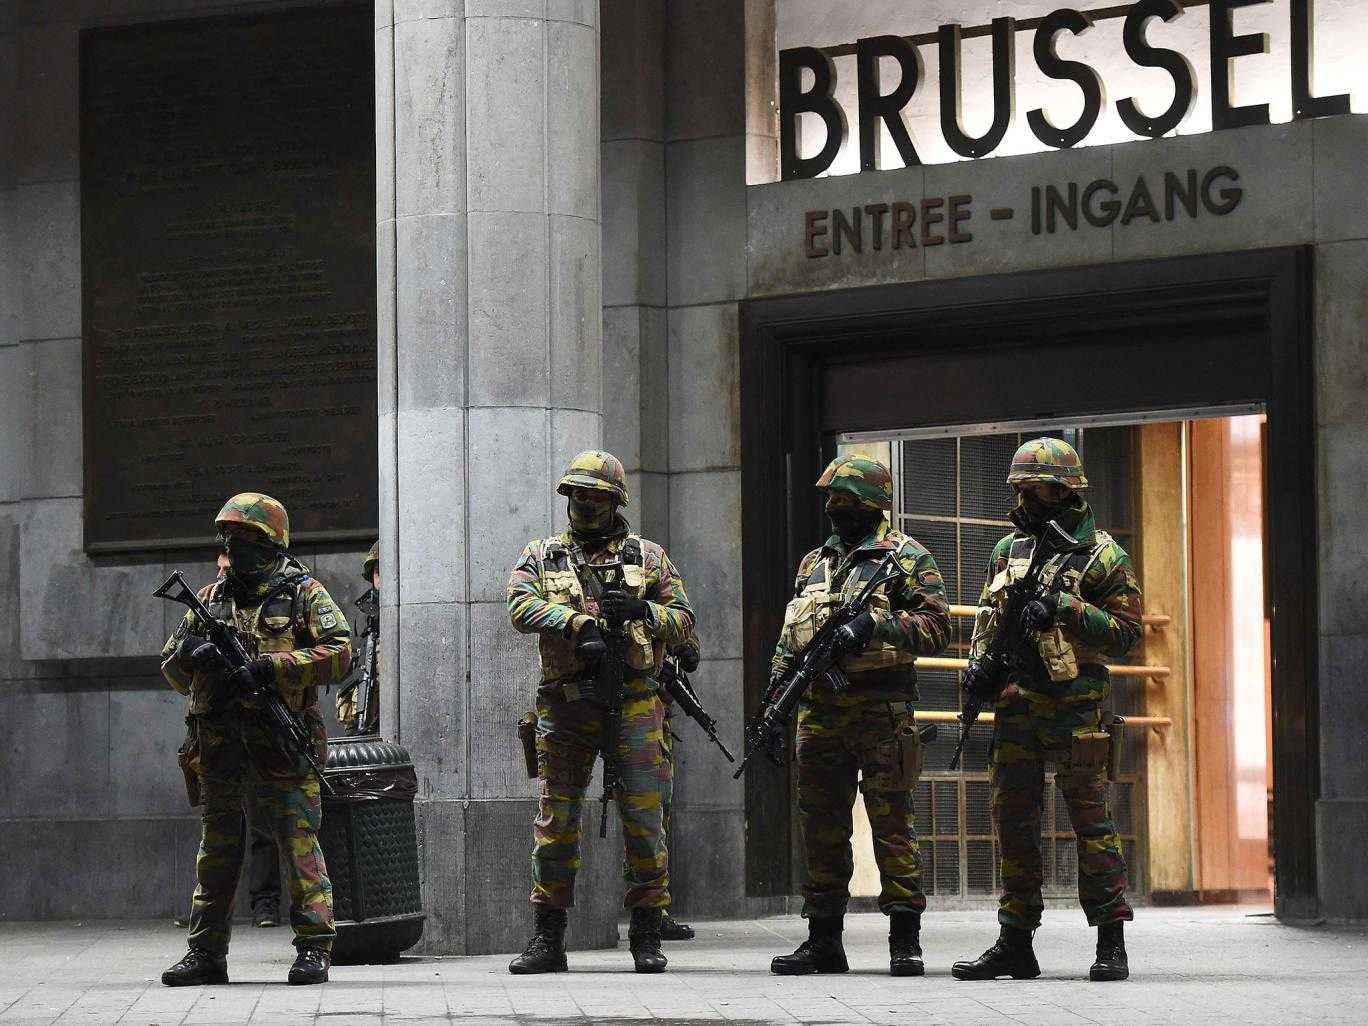 "MILITARIZAREA EUROPEI. Starea de alerta se prelungeste in Bruxelles/ PARISUL: MAI MULTA POLITIE INARMATA, MAI MULTE CAMERE DE SUPRAVEGHERE/ Rusia si Franta coopereaza in MEDITERANA/ PATRIARHIA MOSCOVEI e de acord cu uciderea teroristilor FARA judecata si vrea COALITIE INTERNATIONALA EFECTIVA anti-jihad, cu RUSIA ca ""lider mondial"""